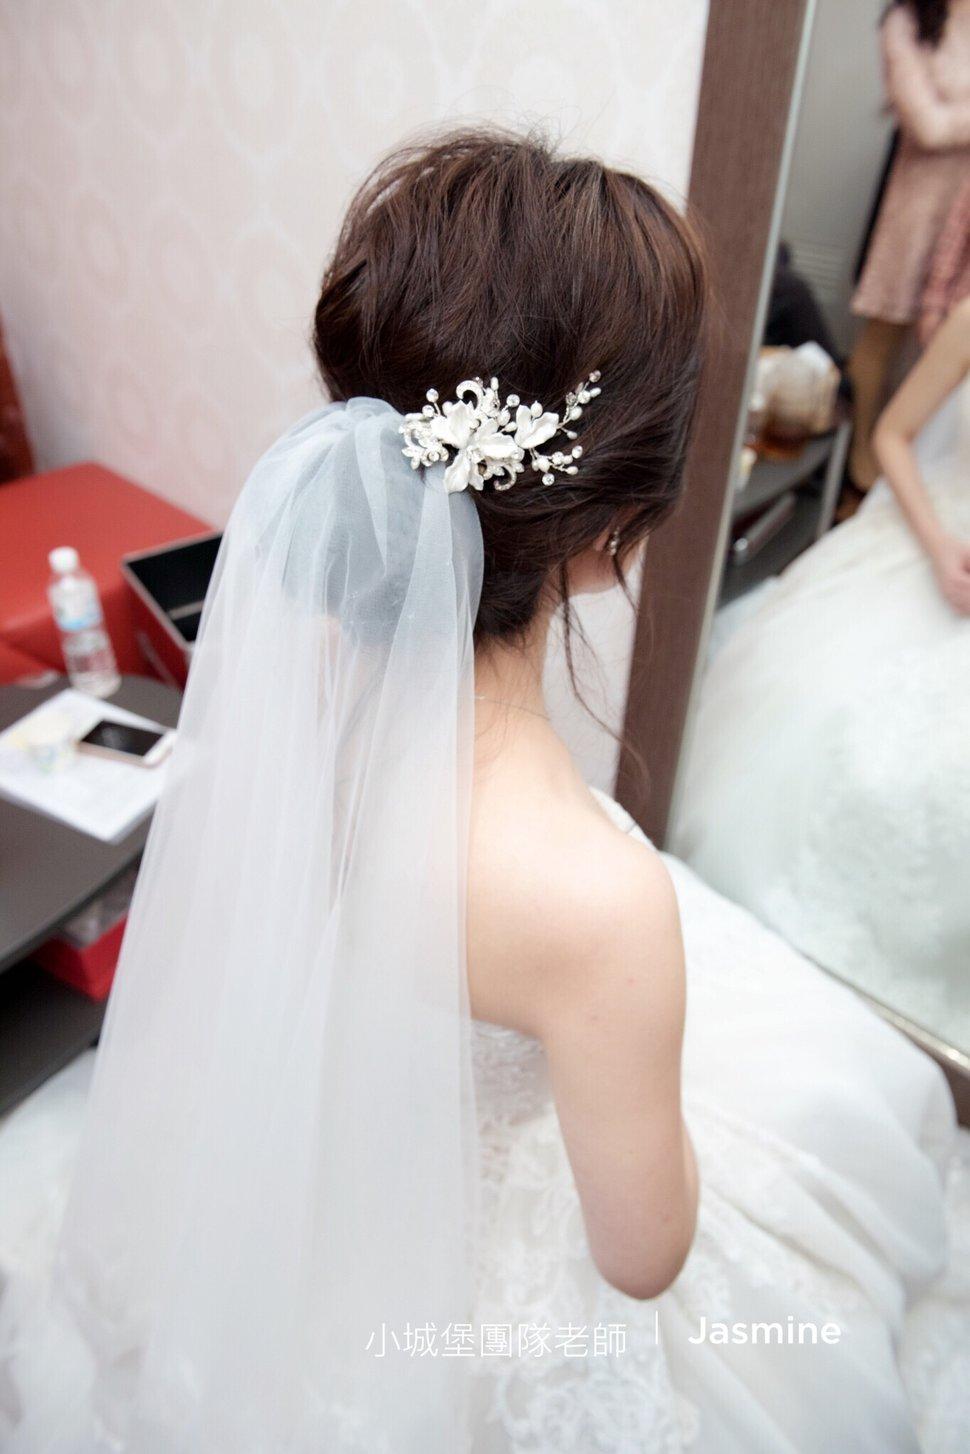 971D52FC-F8B8-4B27-9731-62A444F244AF - Jasmine Makeup新娘秘書《結婚吧》